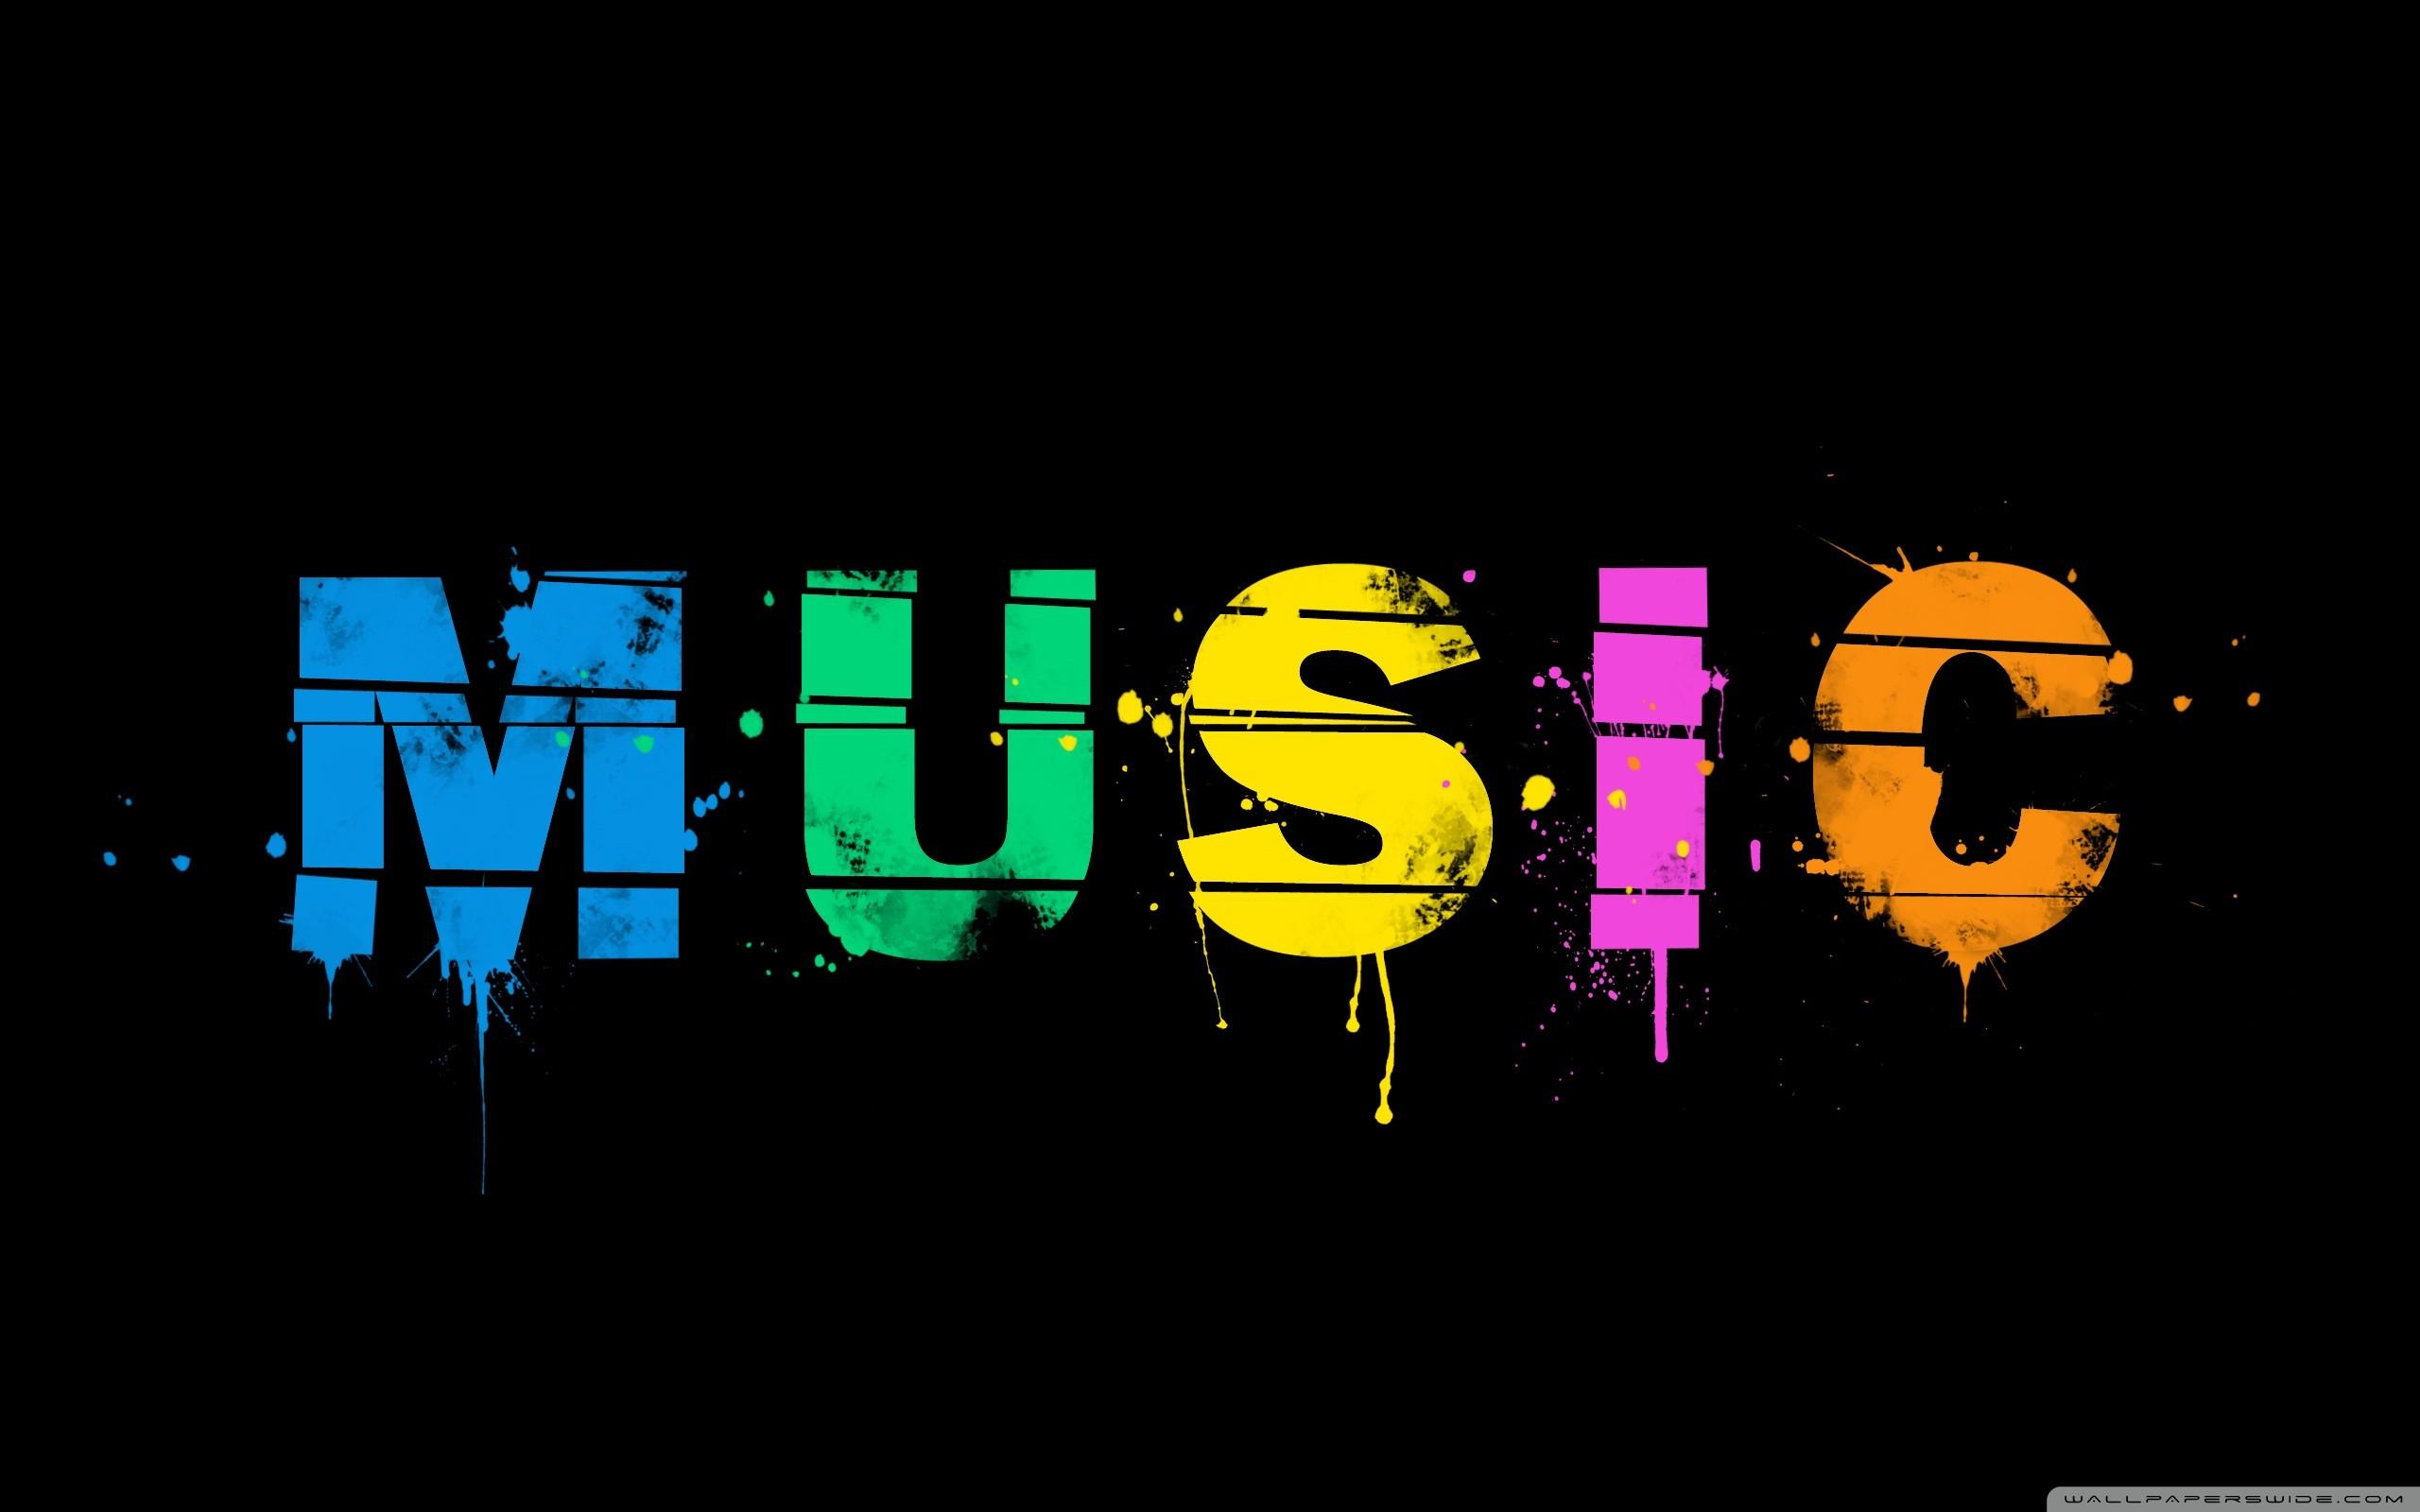 … music splash hd desktop wallpaper high definition fullscreen …